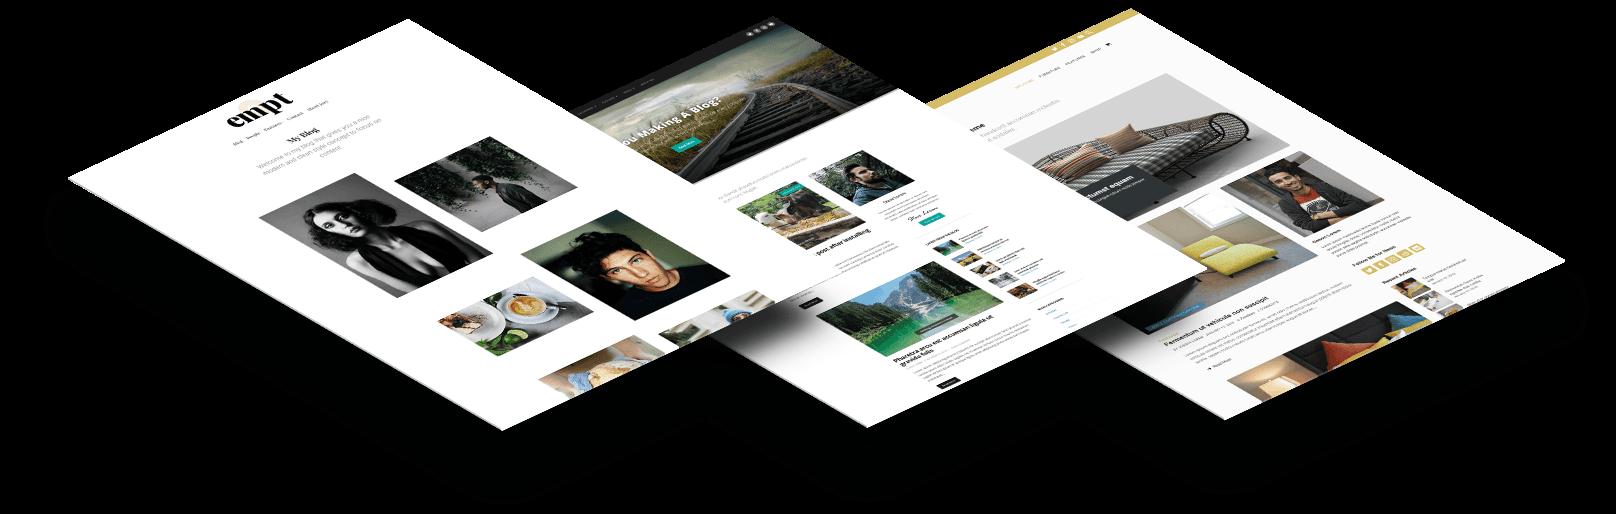 WordPress themes banner